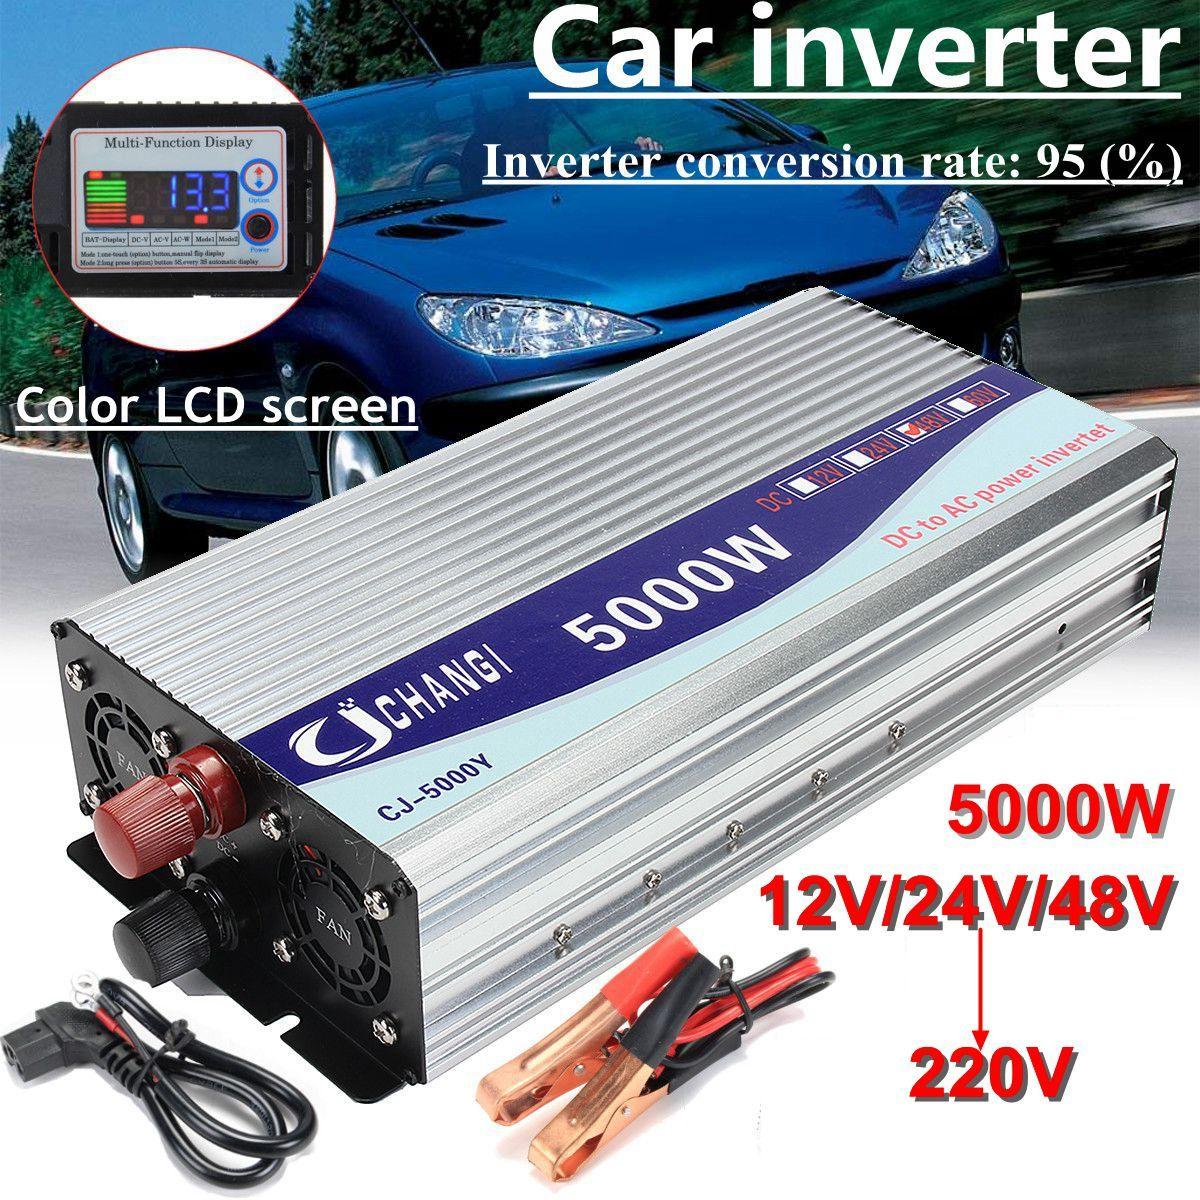 Inverter 12V/24V/48V 220V 5000W 10000W Peak- Modified Sine Wave Power Voltage transformer Inverter Converter + LCD displayInverter 12V/24V/48V 220V 5000W 10000W Peak- Modified Sine Wave Power Voltage transformer Inverter Converter + LCD display